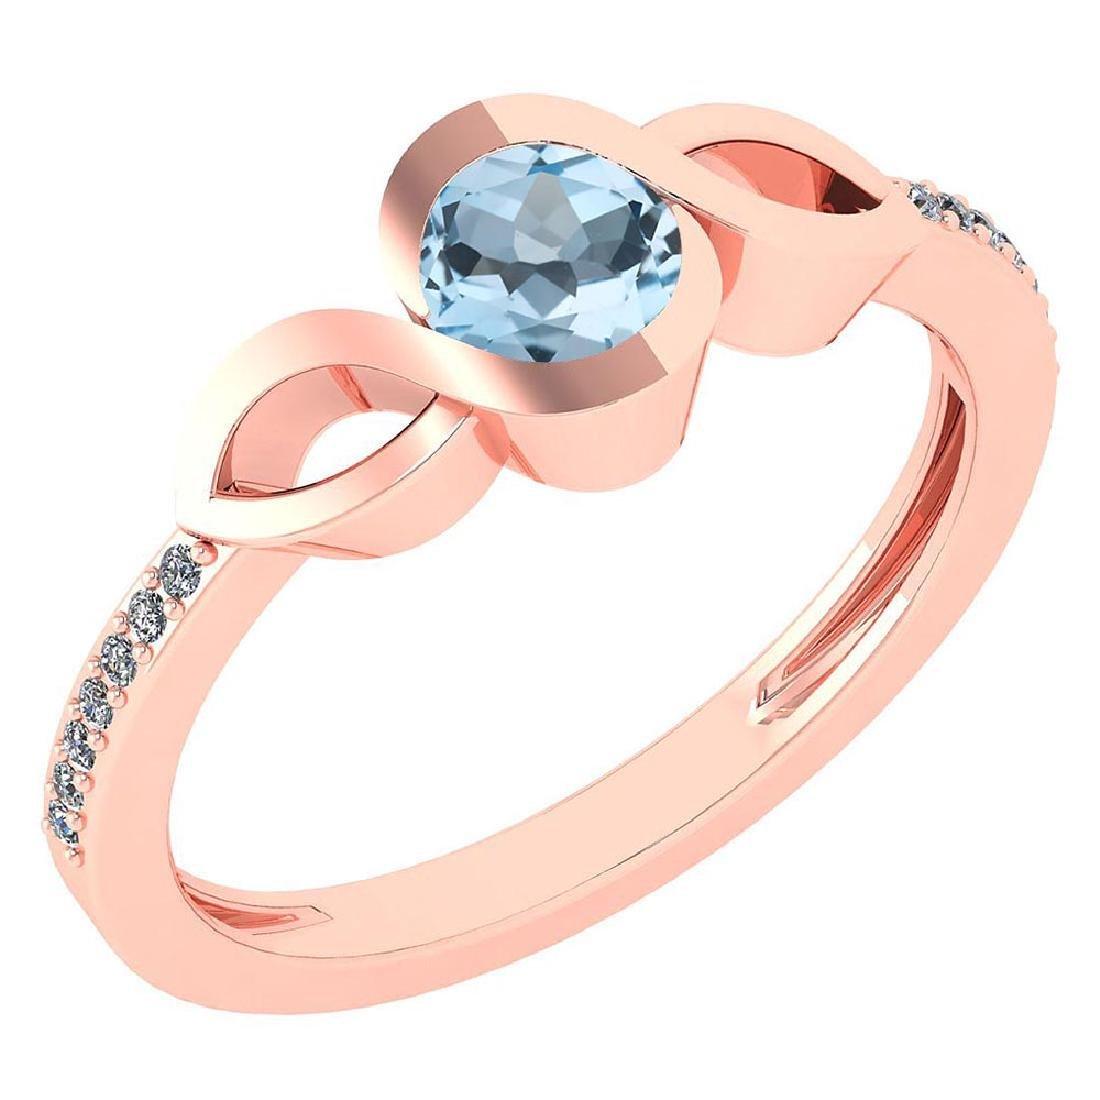 Certified 0.52 Ctw Aquamarine And Diamond 18K Rose Gold